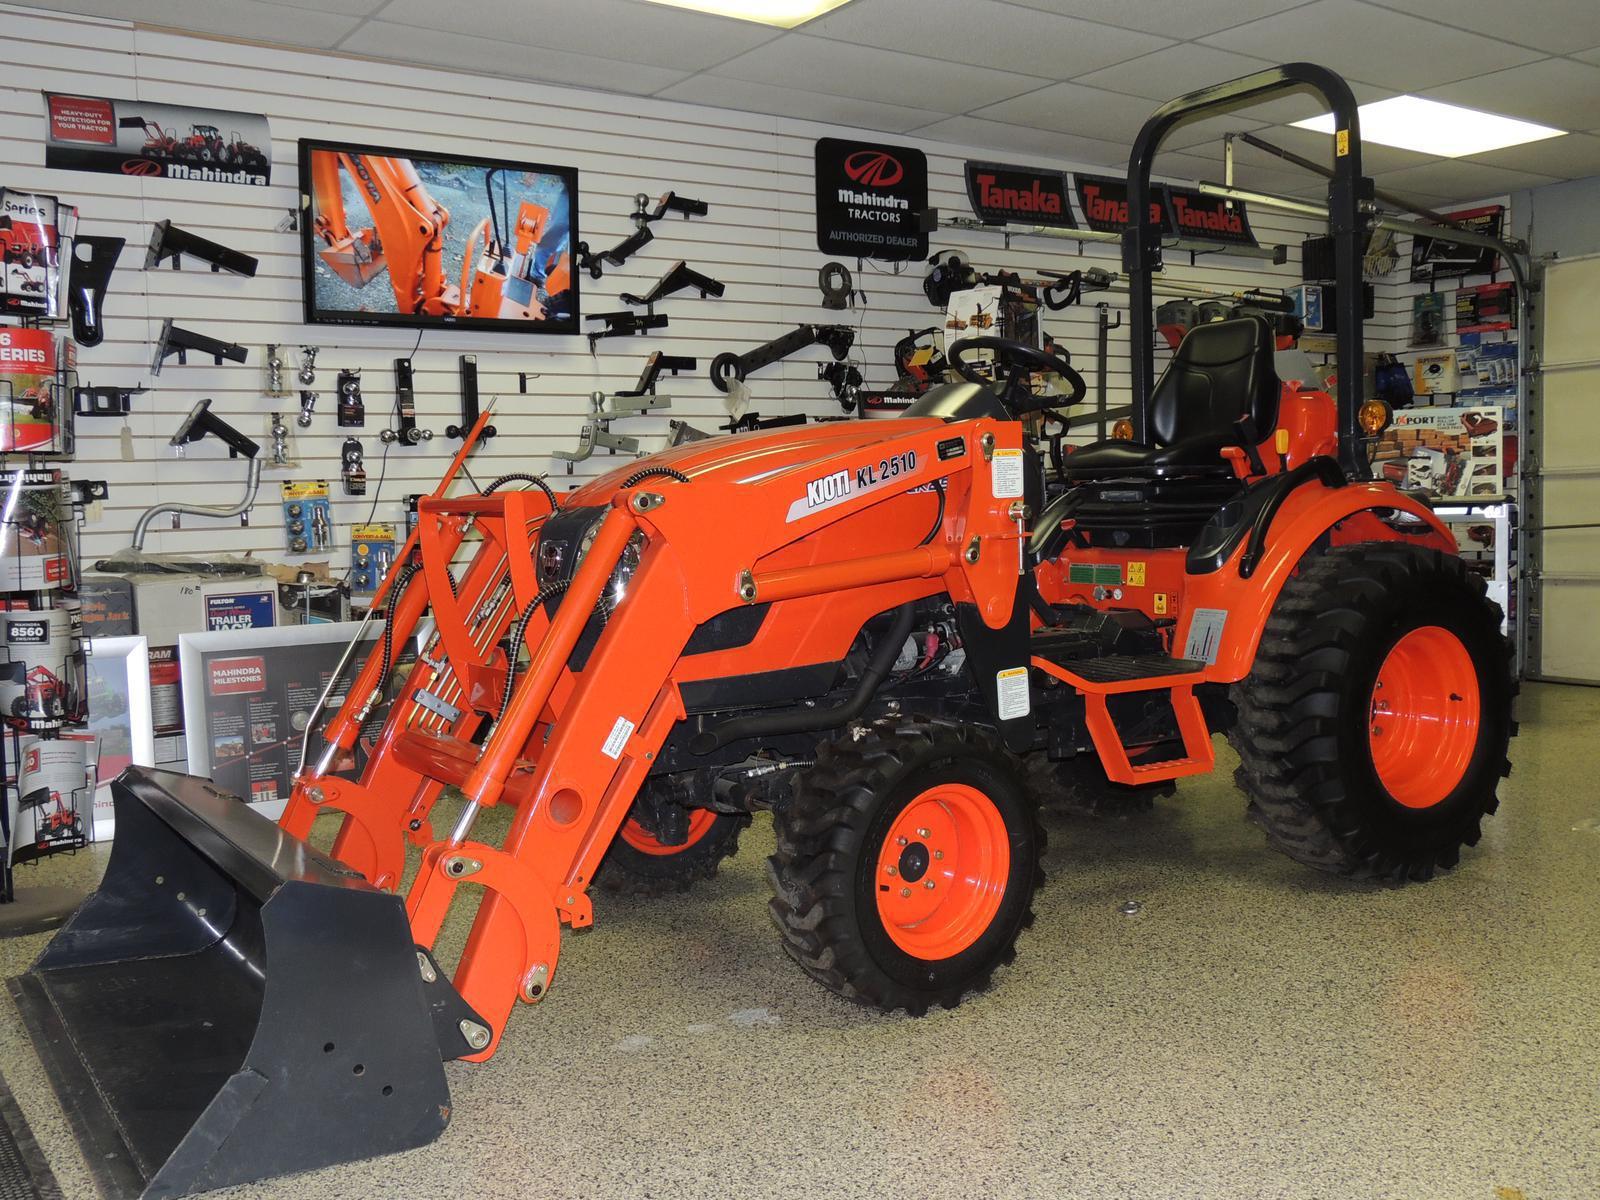 Kioti CK2510 4X4 Tractor Loader (AG/Industrial) - Kioti · Kioti CK2510 4X4  Tractor Loader ...